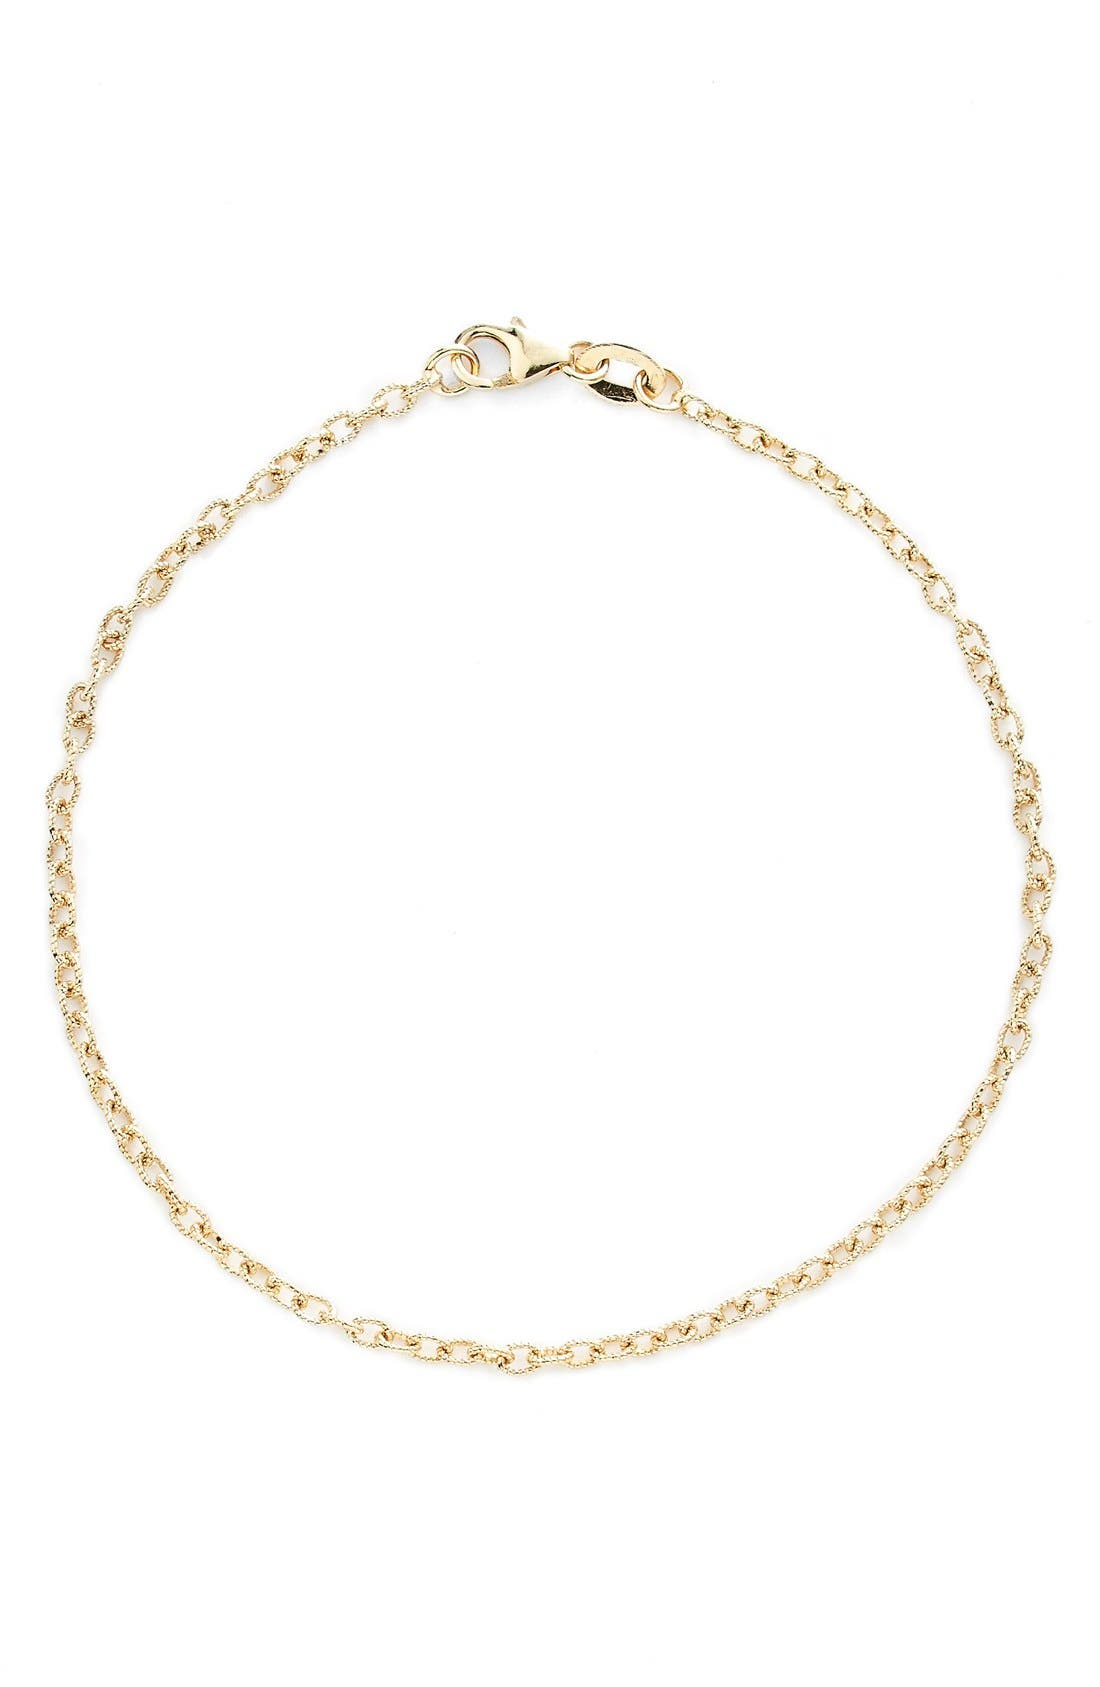 Etched Link Bracelet,                             Main thumbnail 1, color,                             Yellow Gold